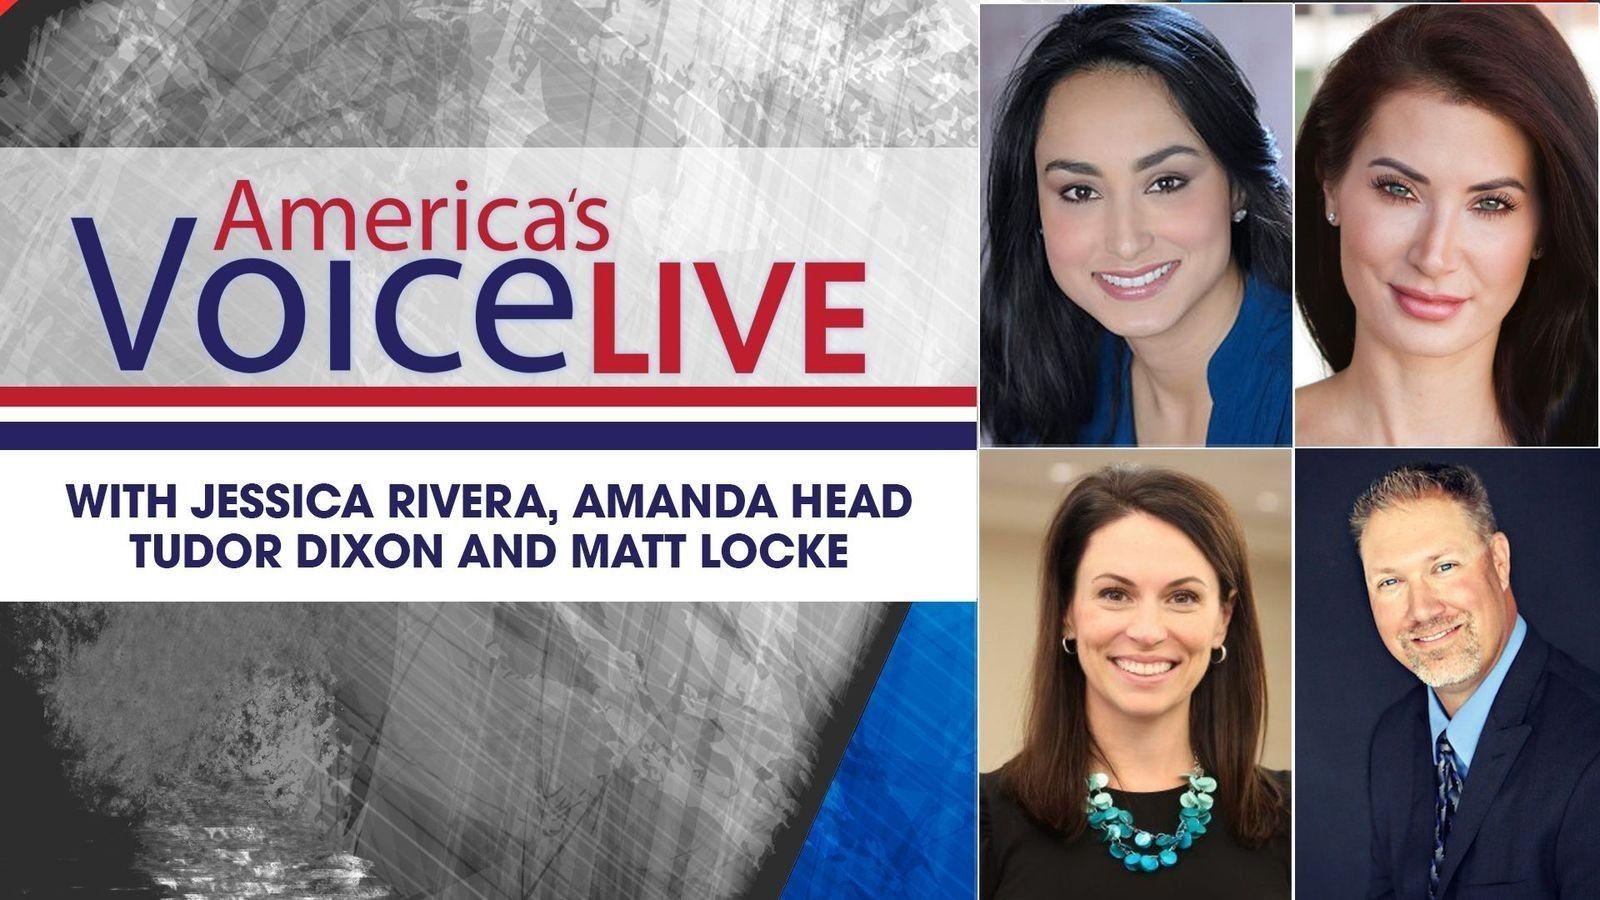 America's Voice Live